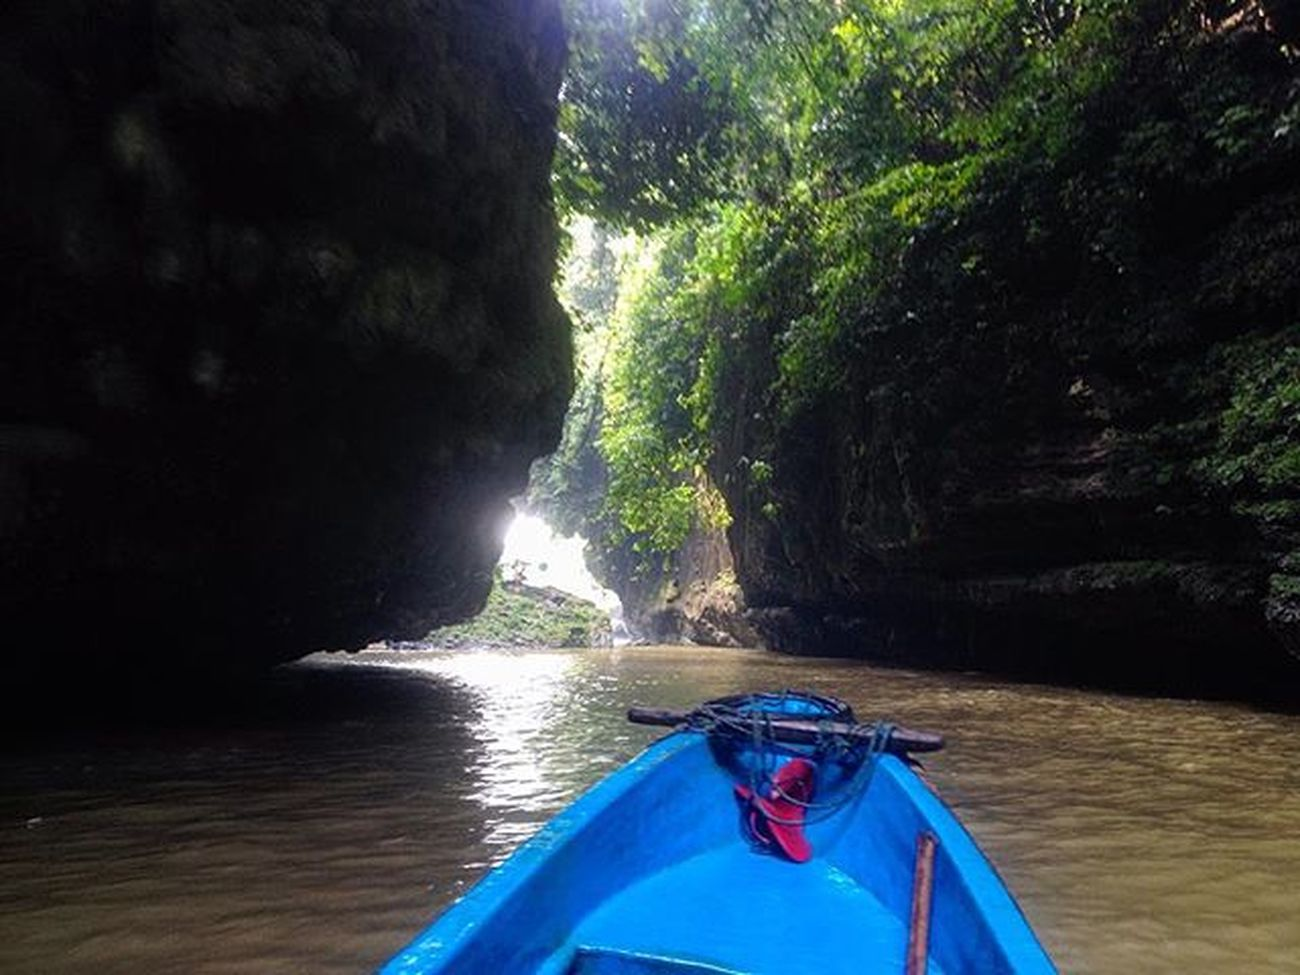 Sendal jepit aja gue ajak foto masa kamu ga mau? Greencanyon  Travelingindonesia Backpackerindonesia Taking Photos